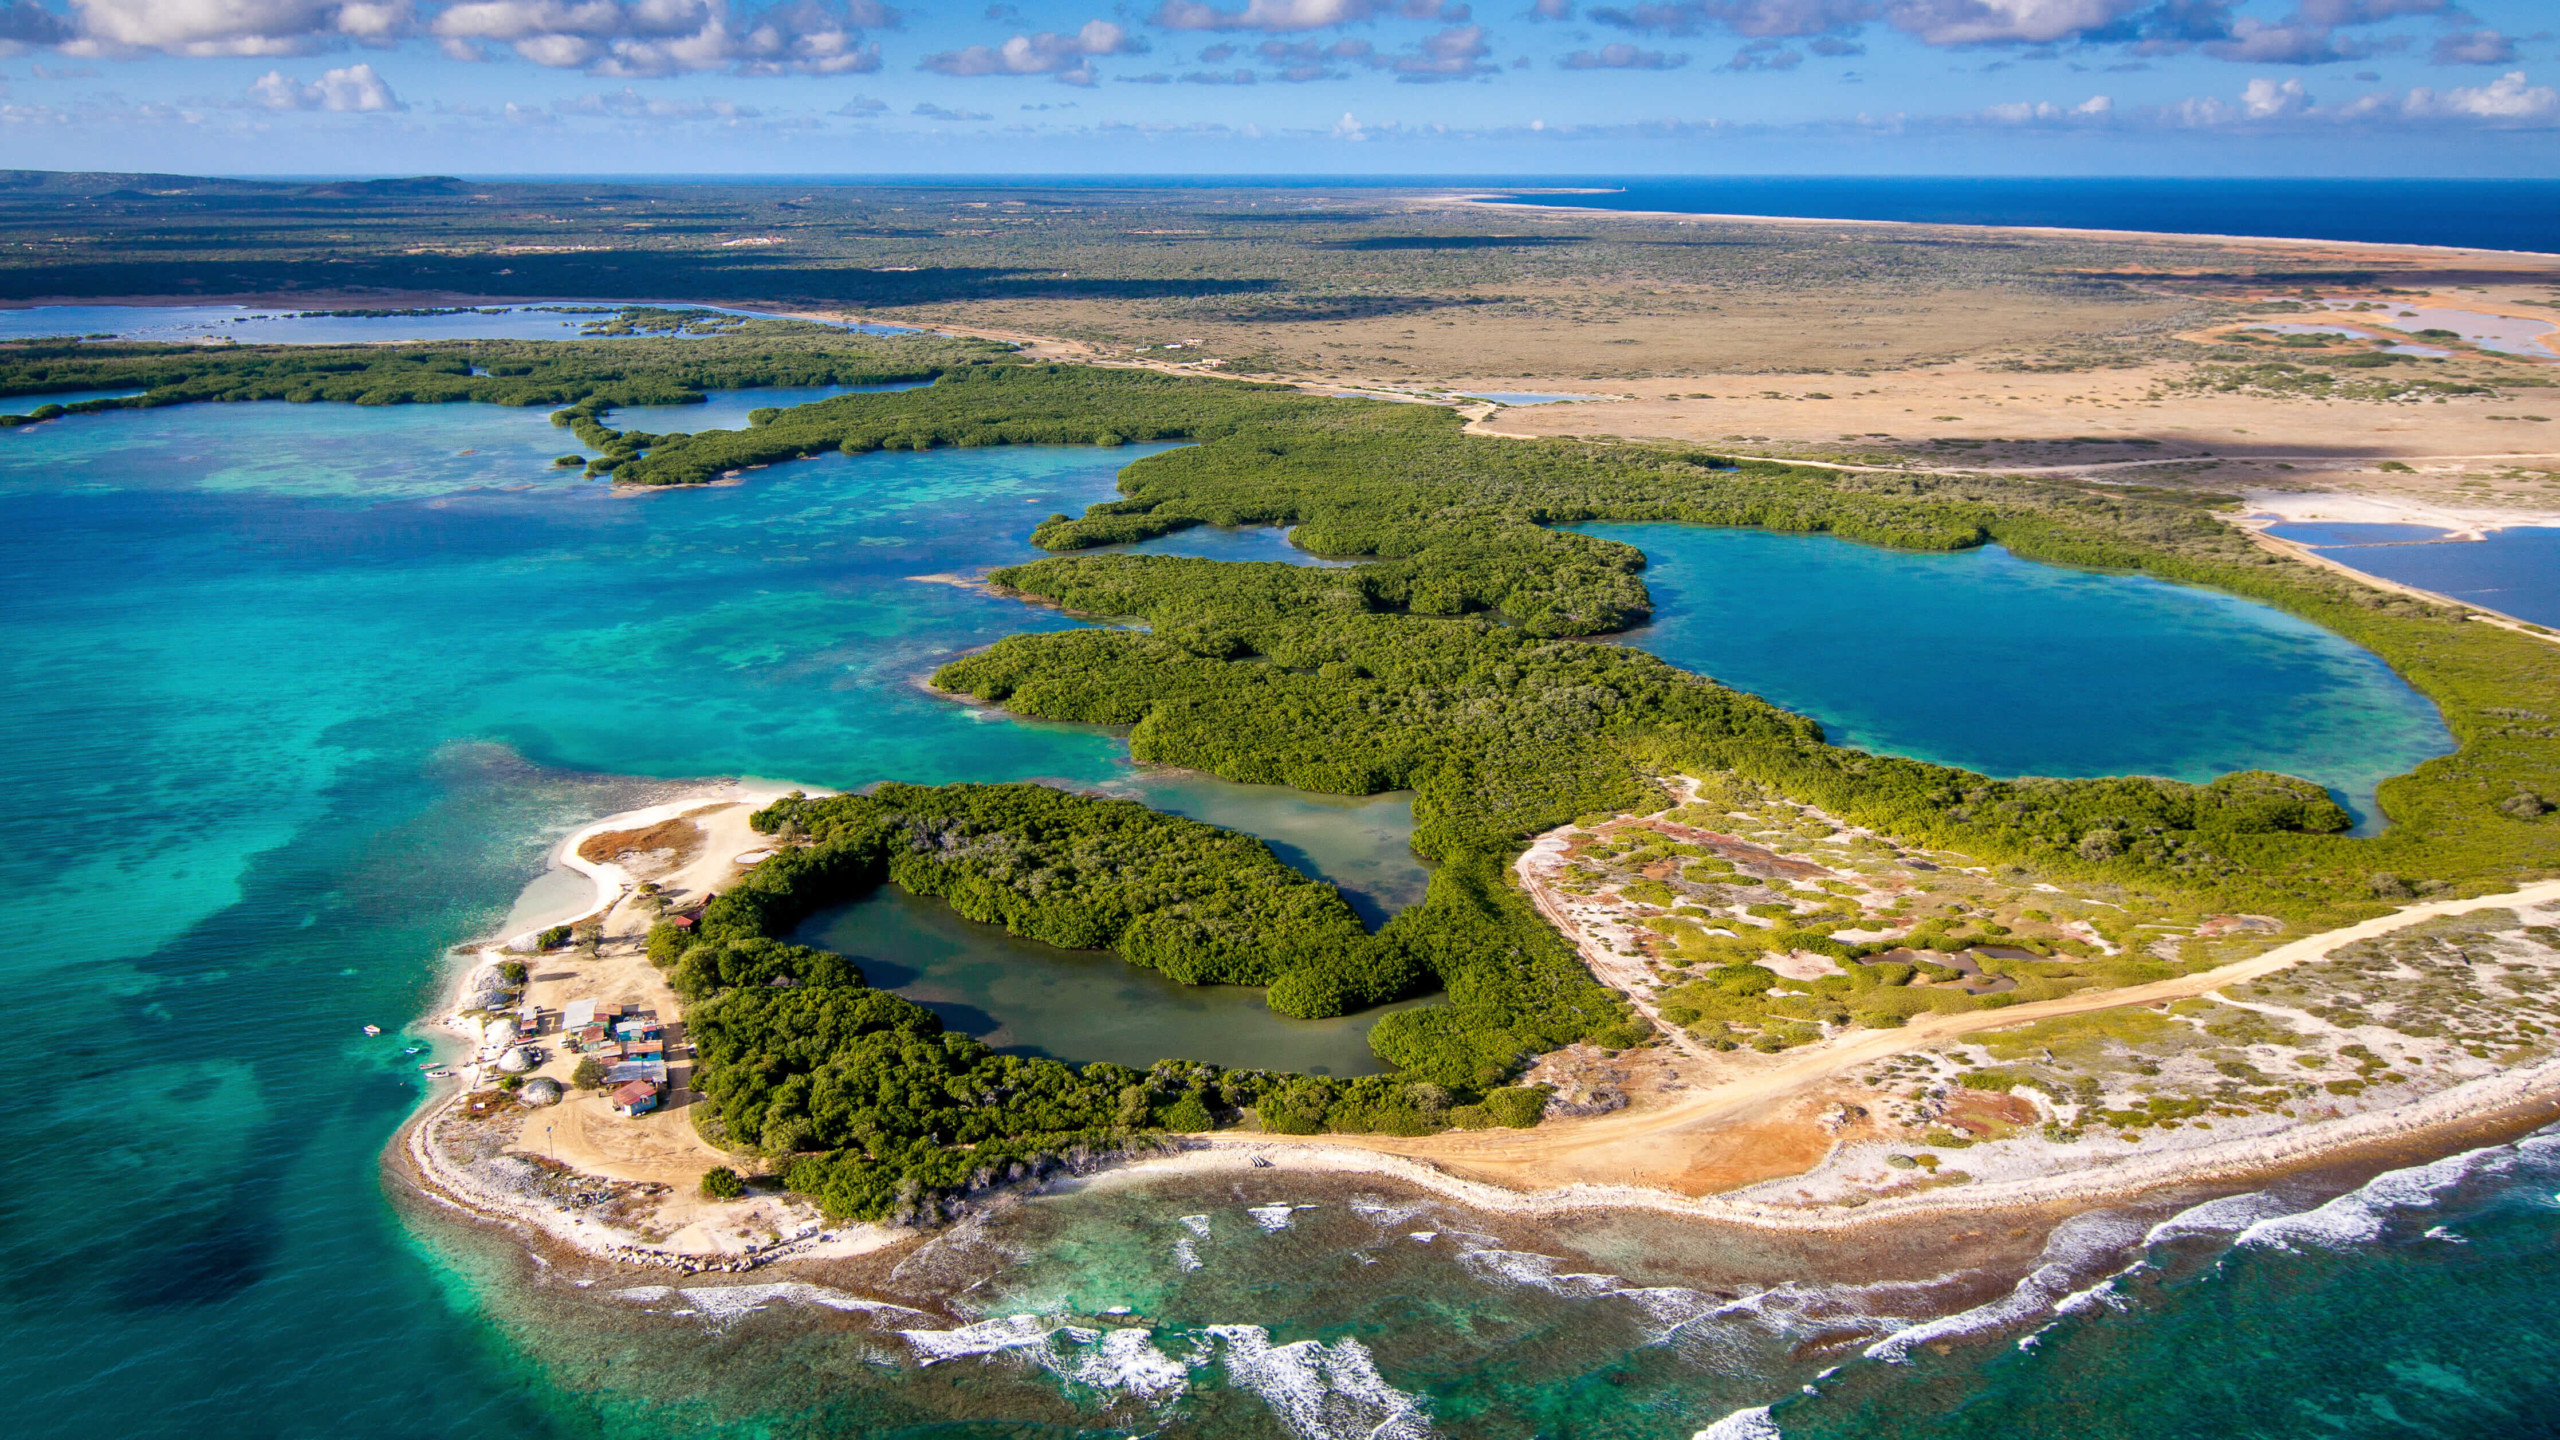 Bonaire Mangroves, Flamingos & Sand